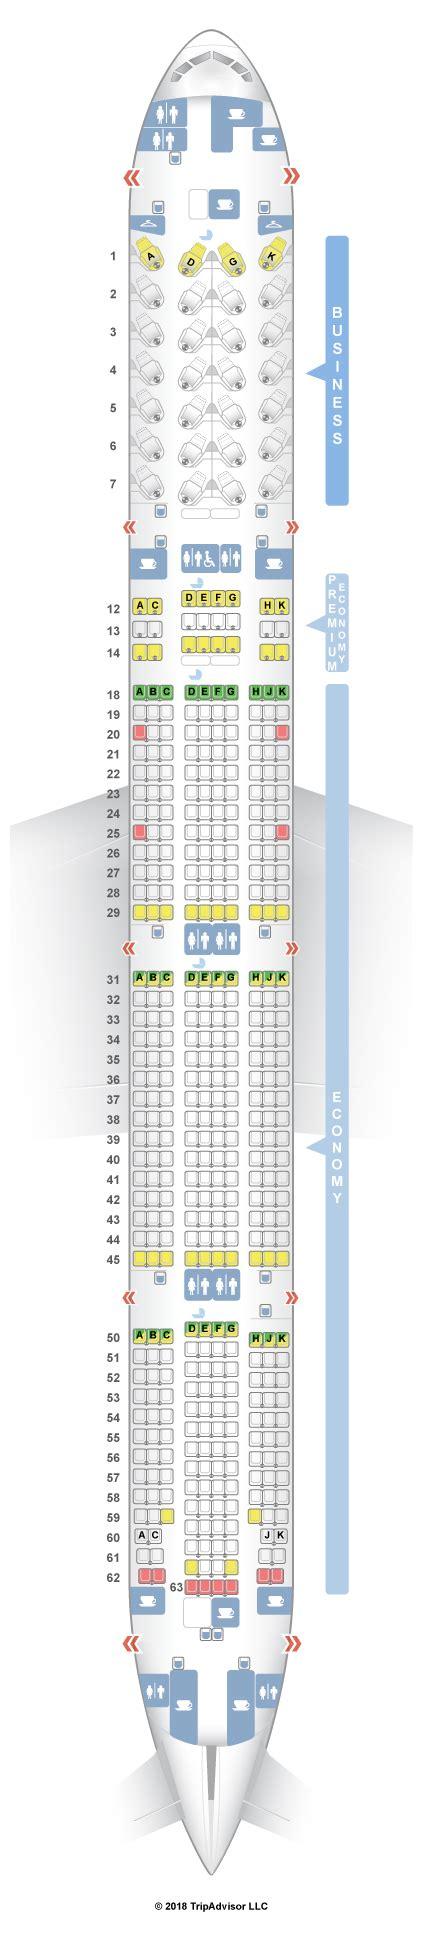 777 300er seat map 777 300er seating images